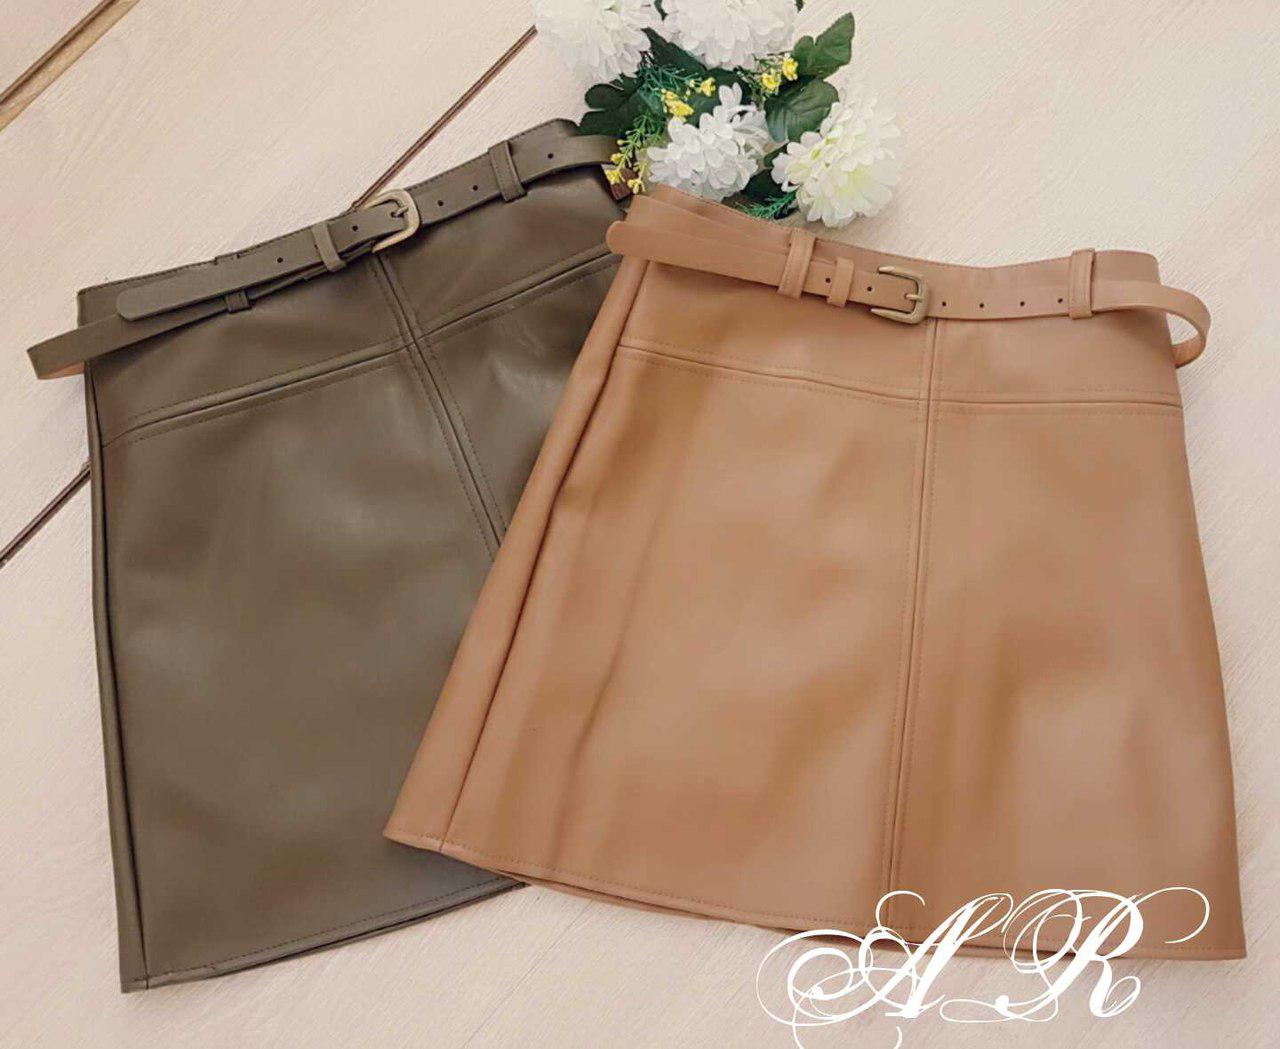 Мини юбка из экокожи со съемным ремешком 42-46 р